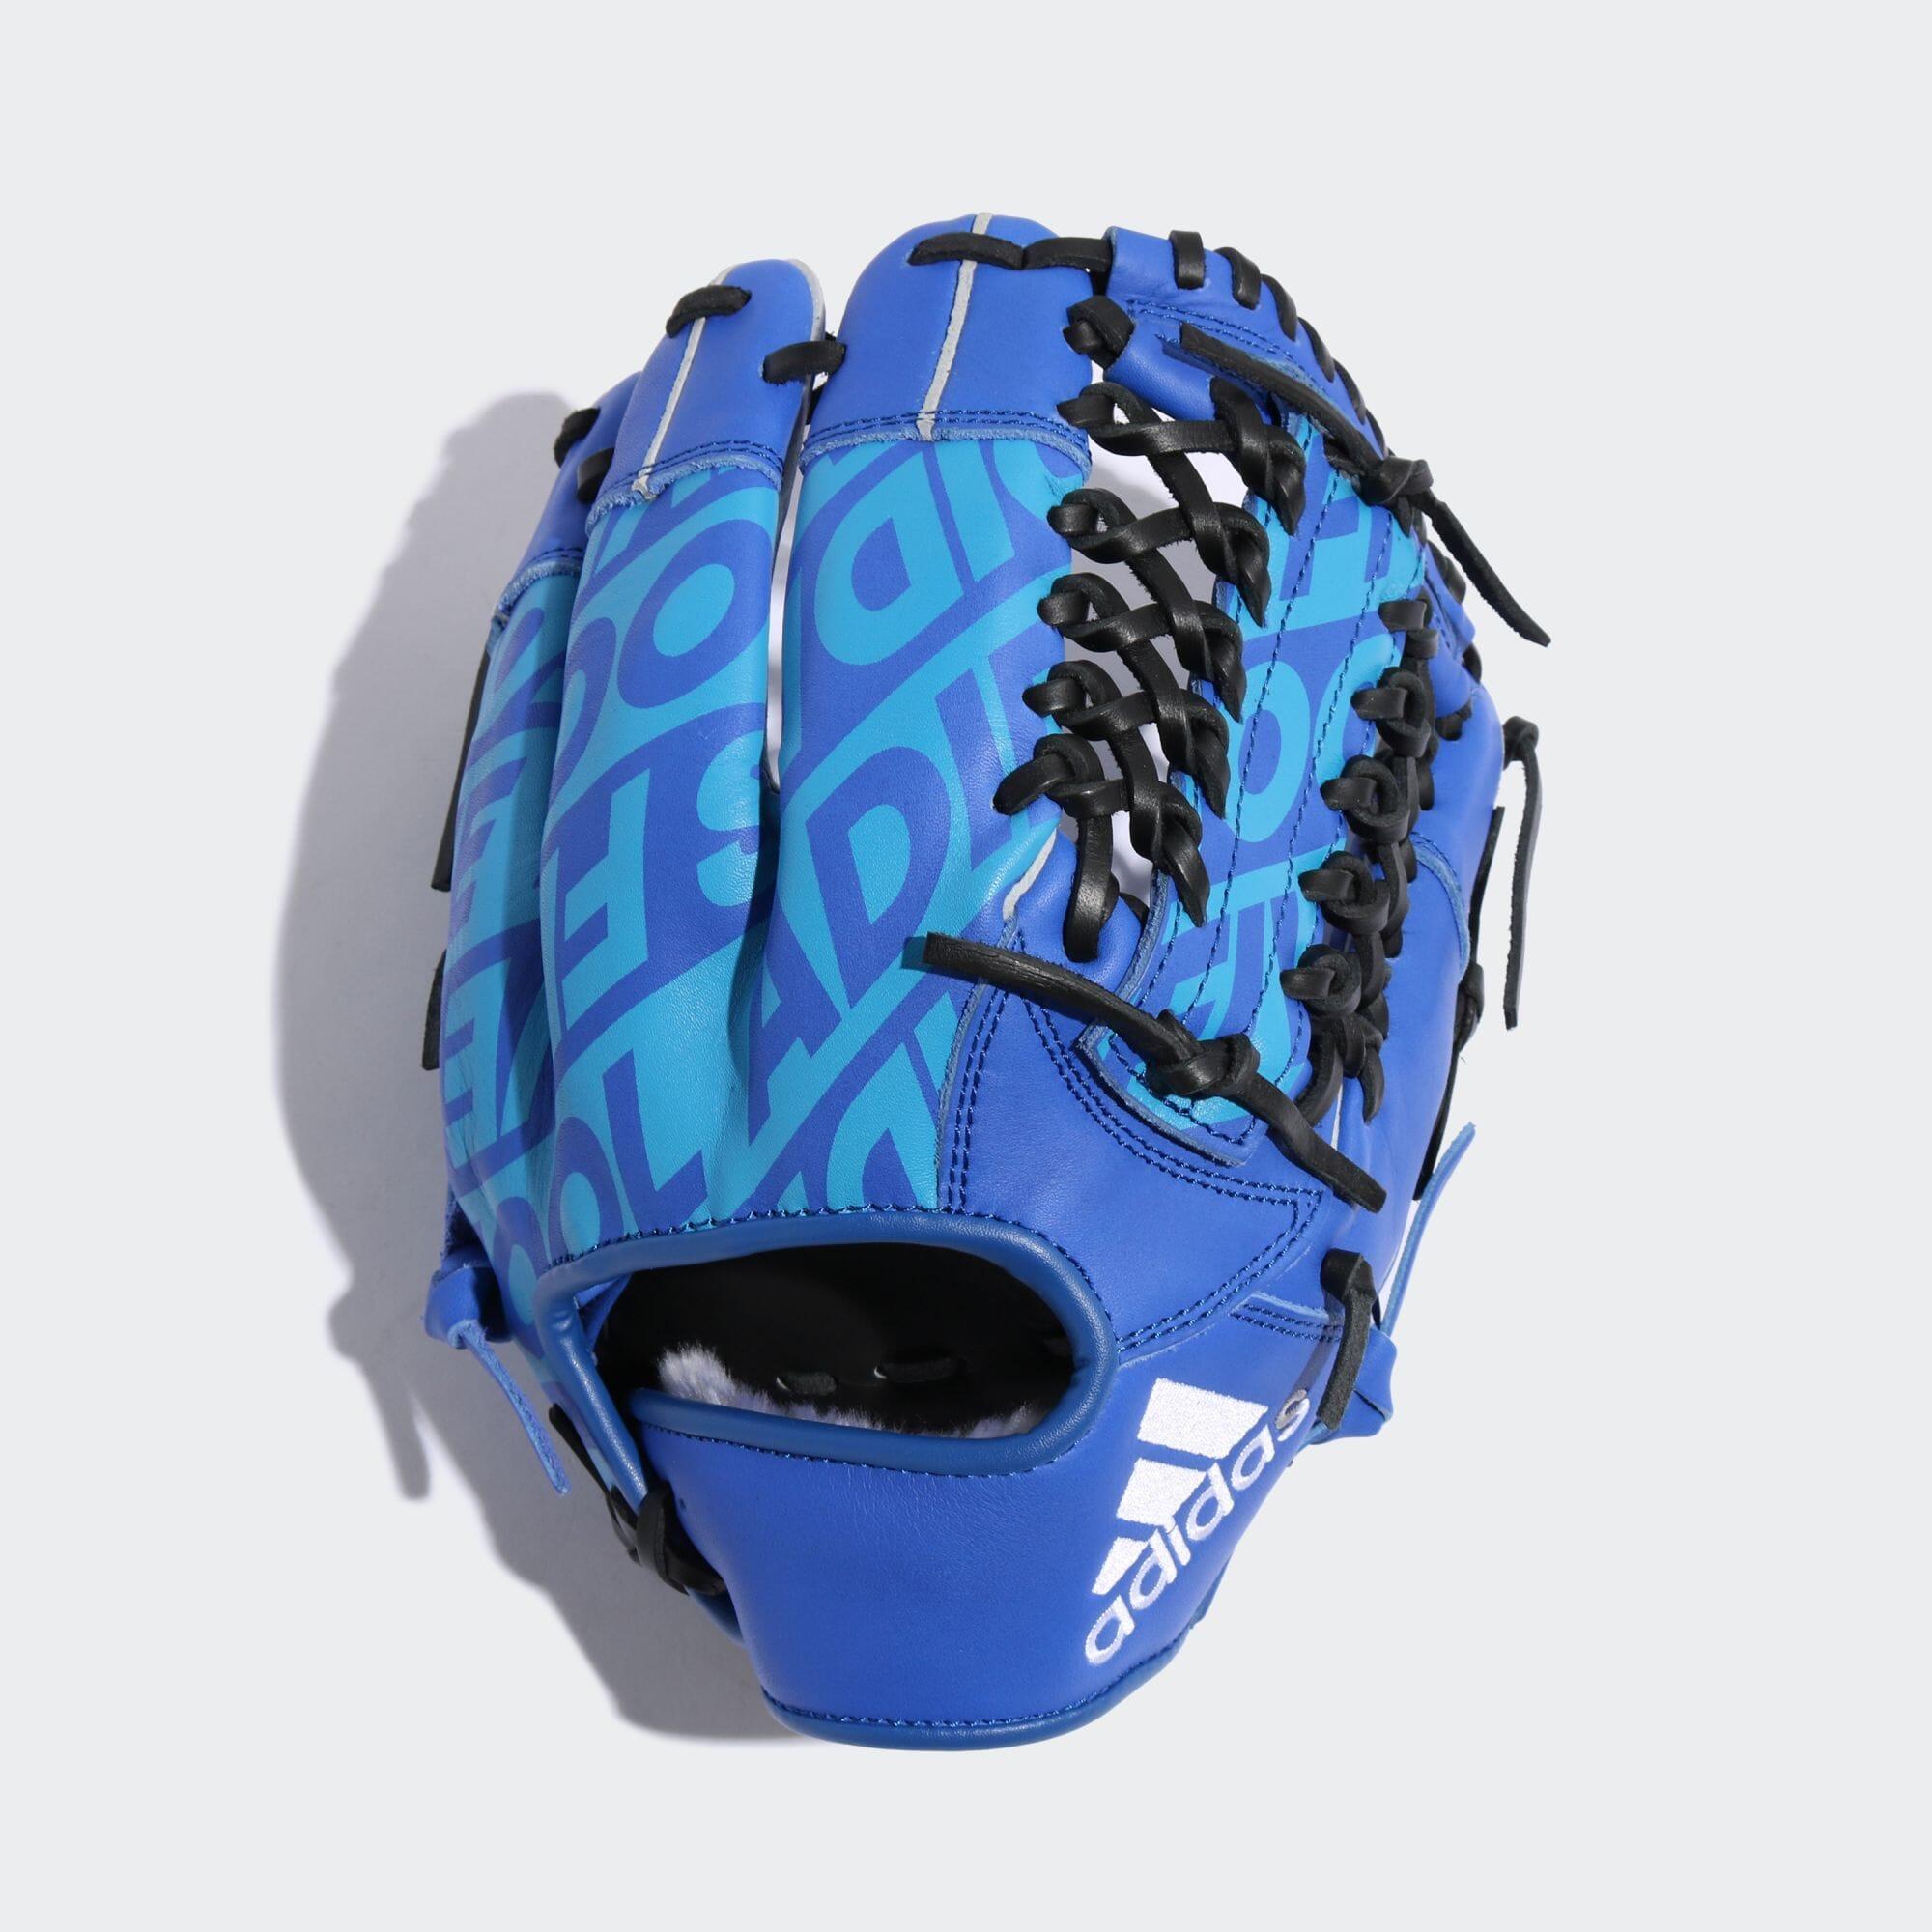 RB カラー ベースボールグラブ / RB Color Baseball Glove